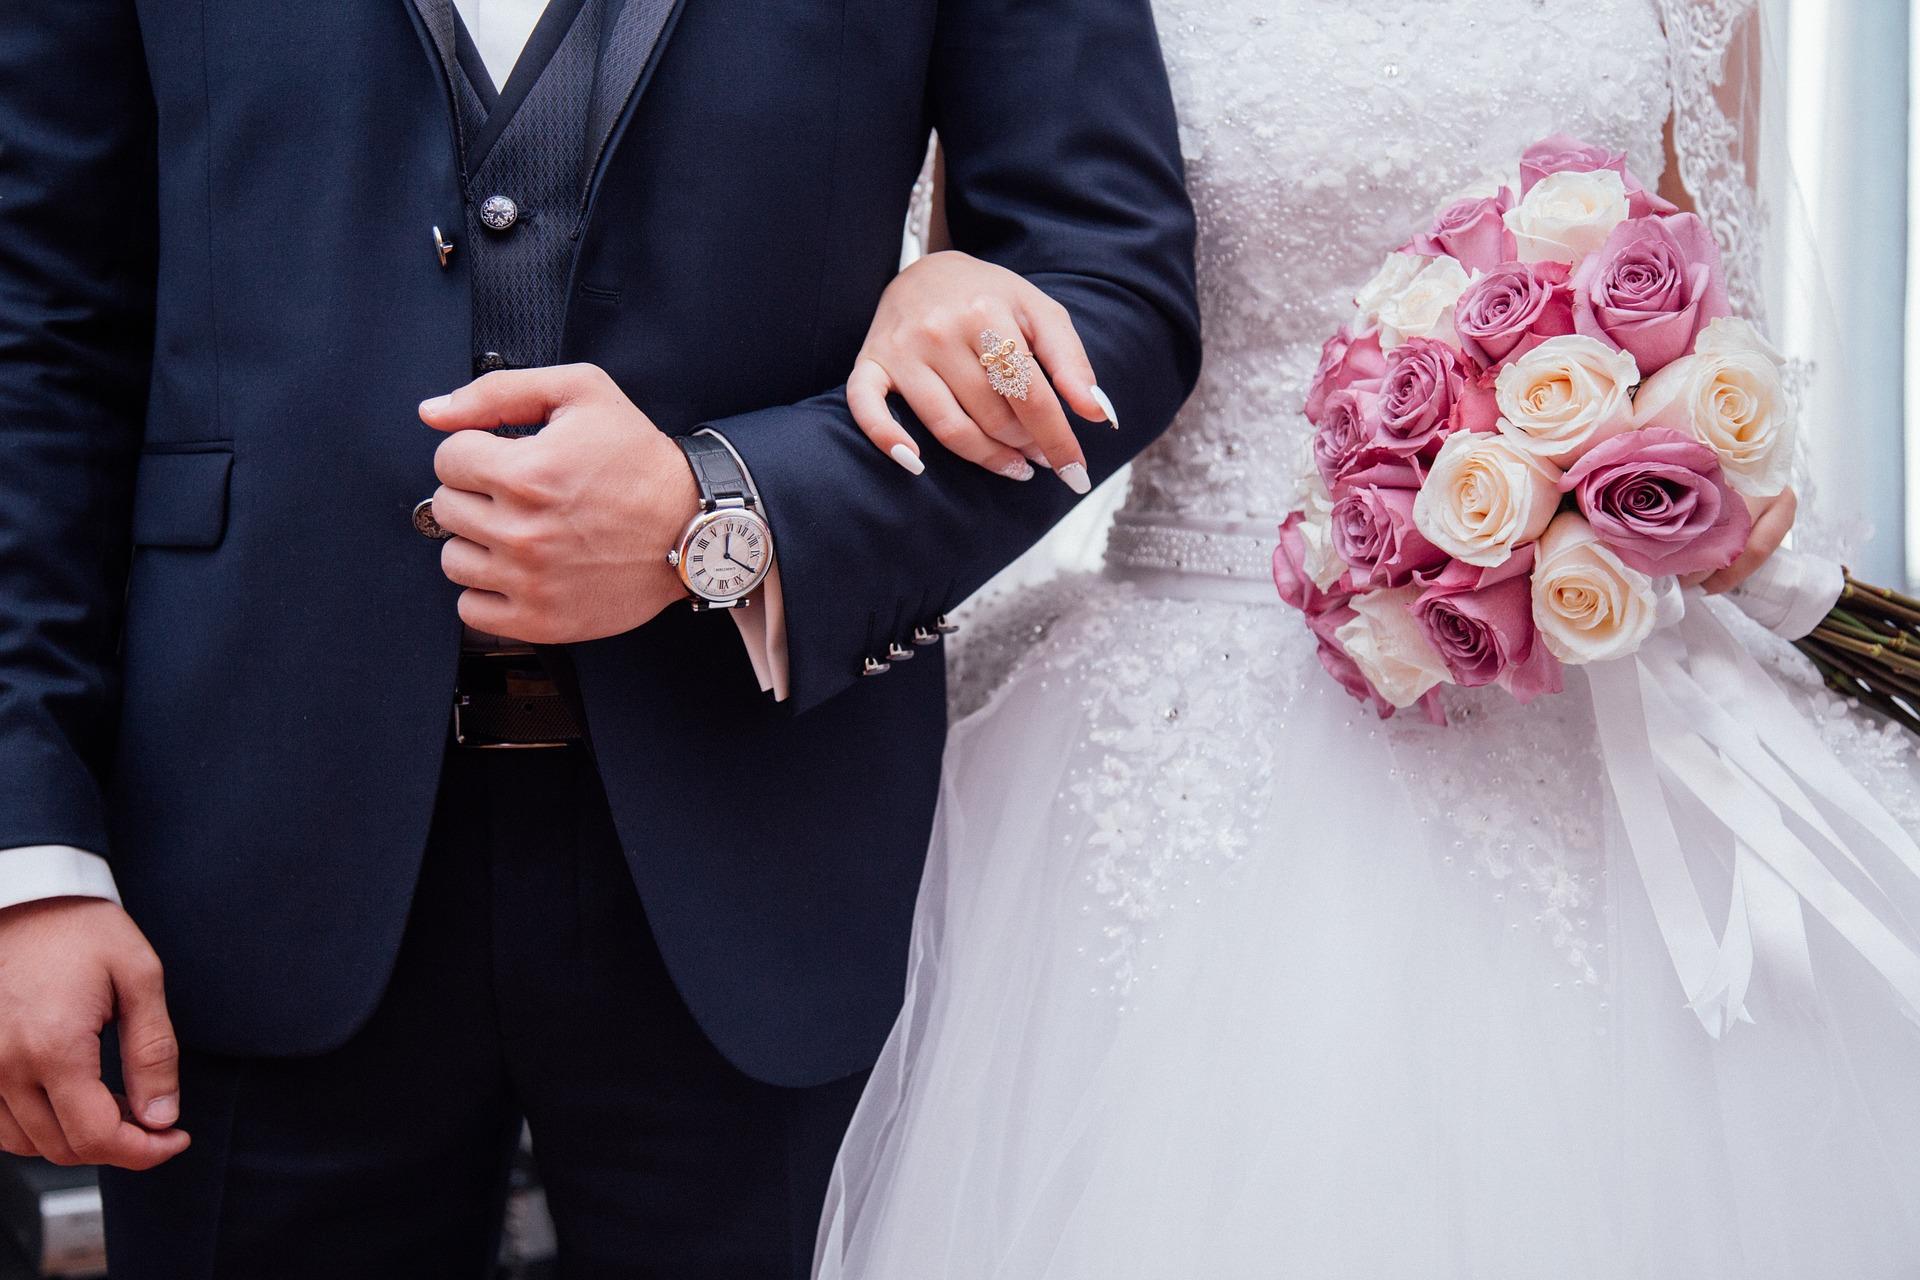 wedding-2595862_1920